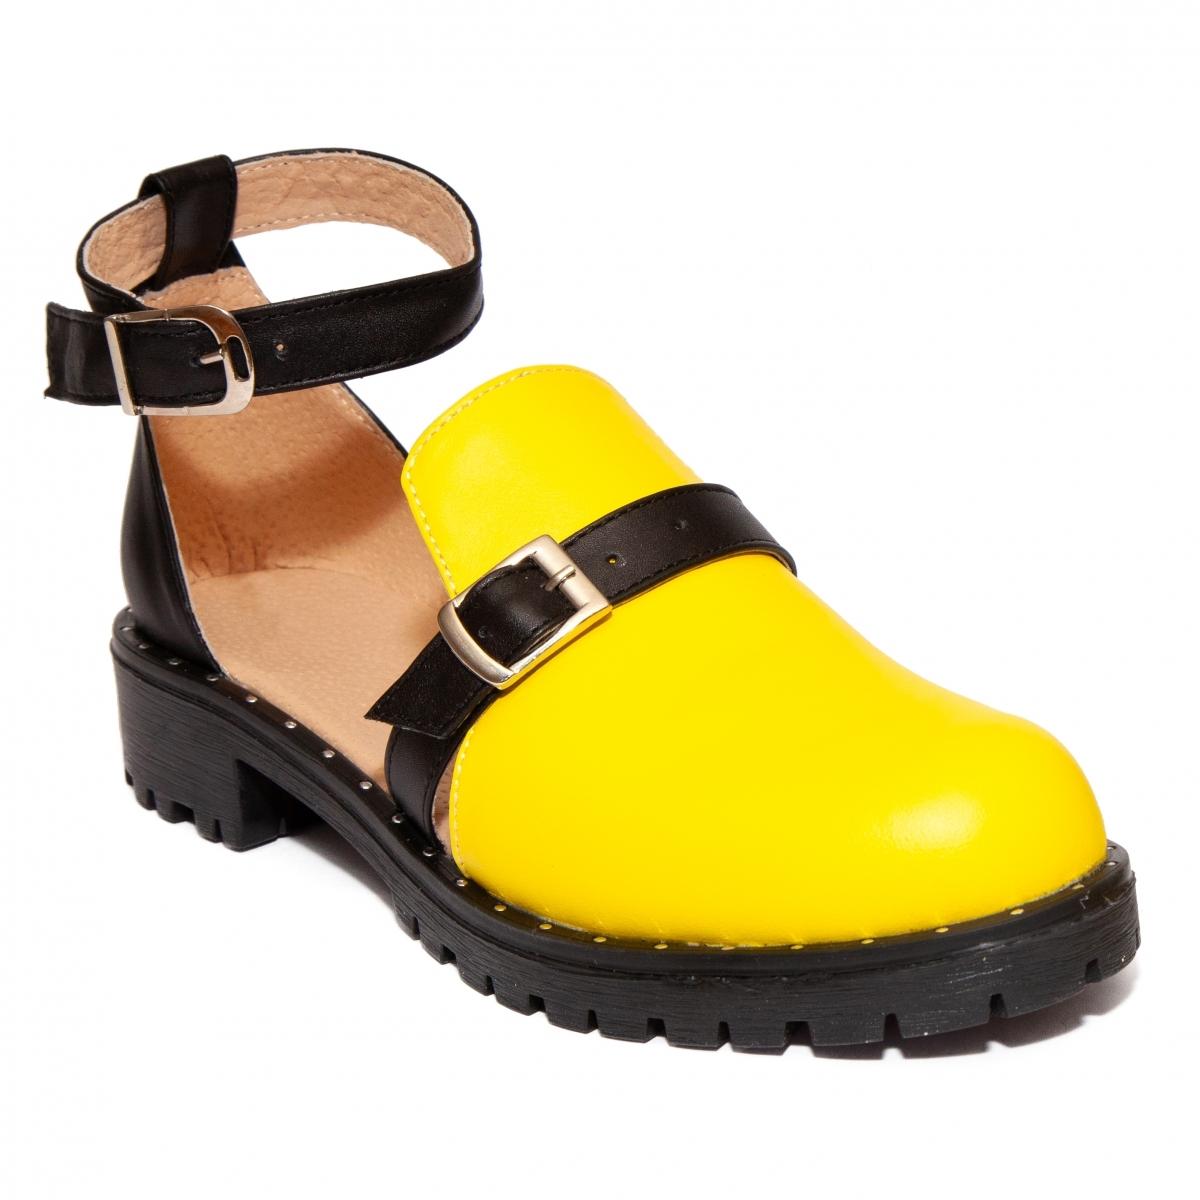 Sandale dama piele 1803 Cika rosu negru 35-40